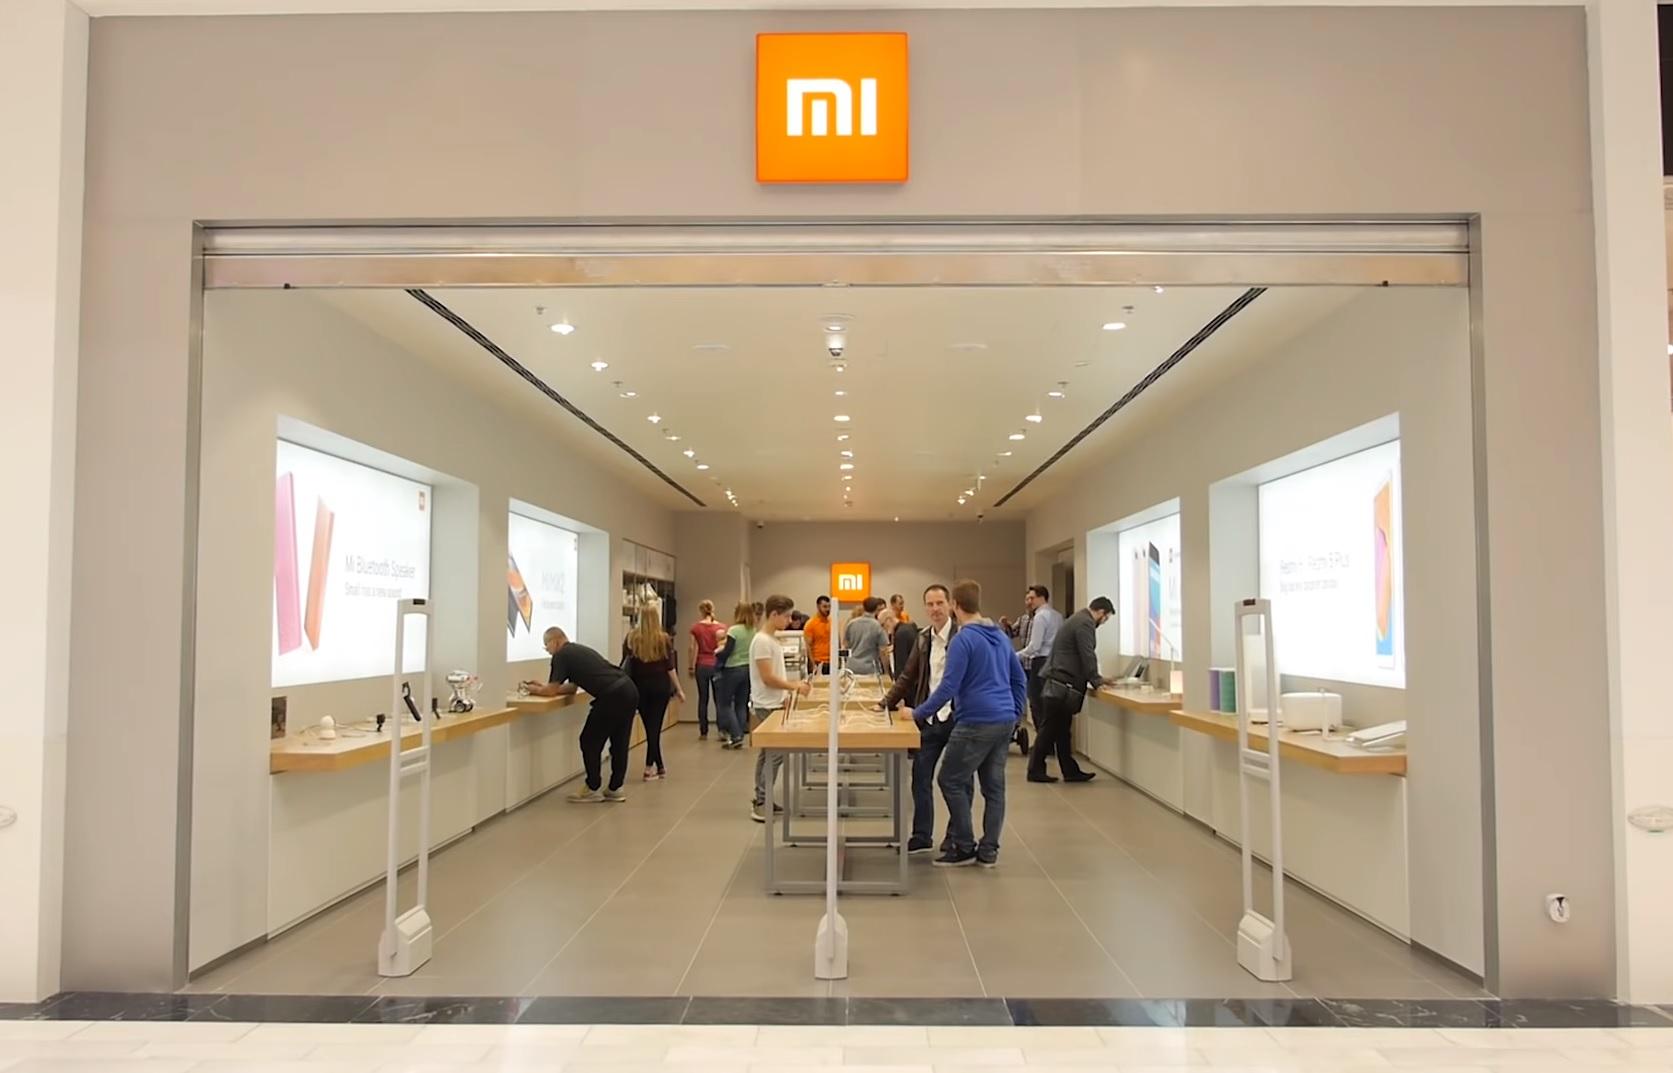 Xiaomi Mi Store Bei Wien Bald Mit Notebooks Flash-Sale Am 26.5. - Notebookcheck.com News